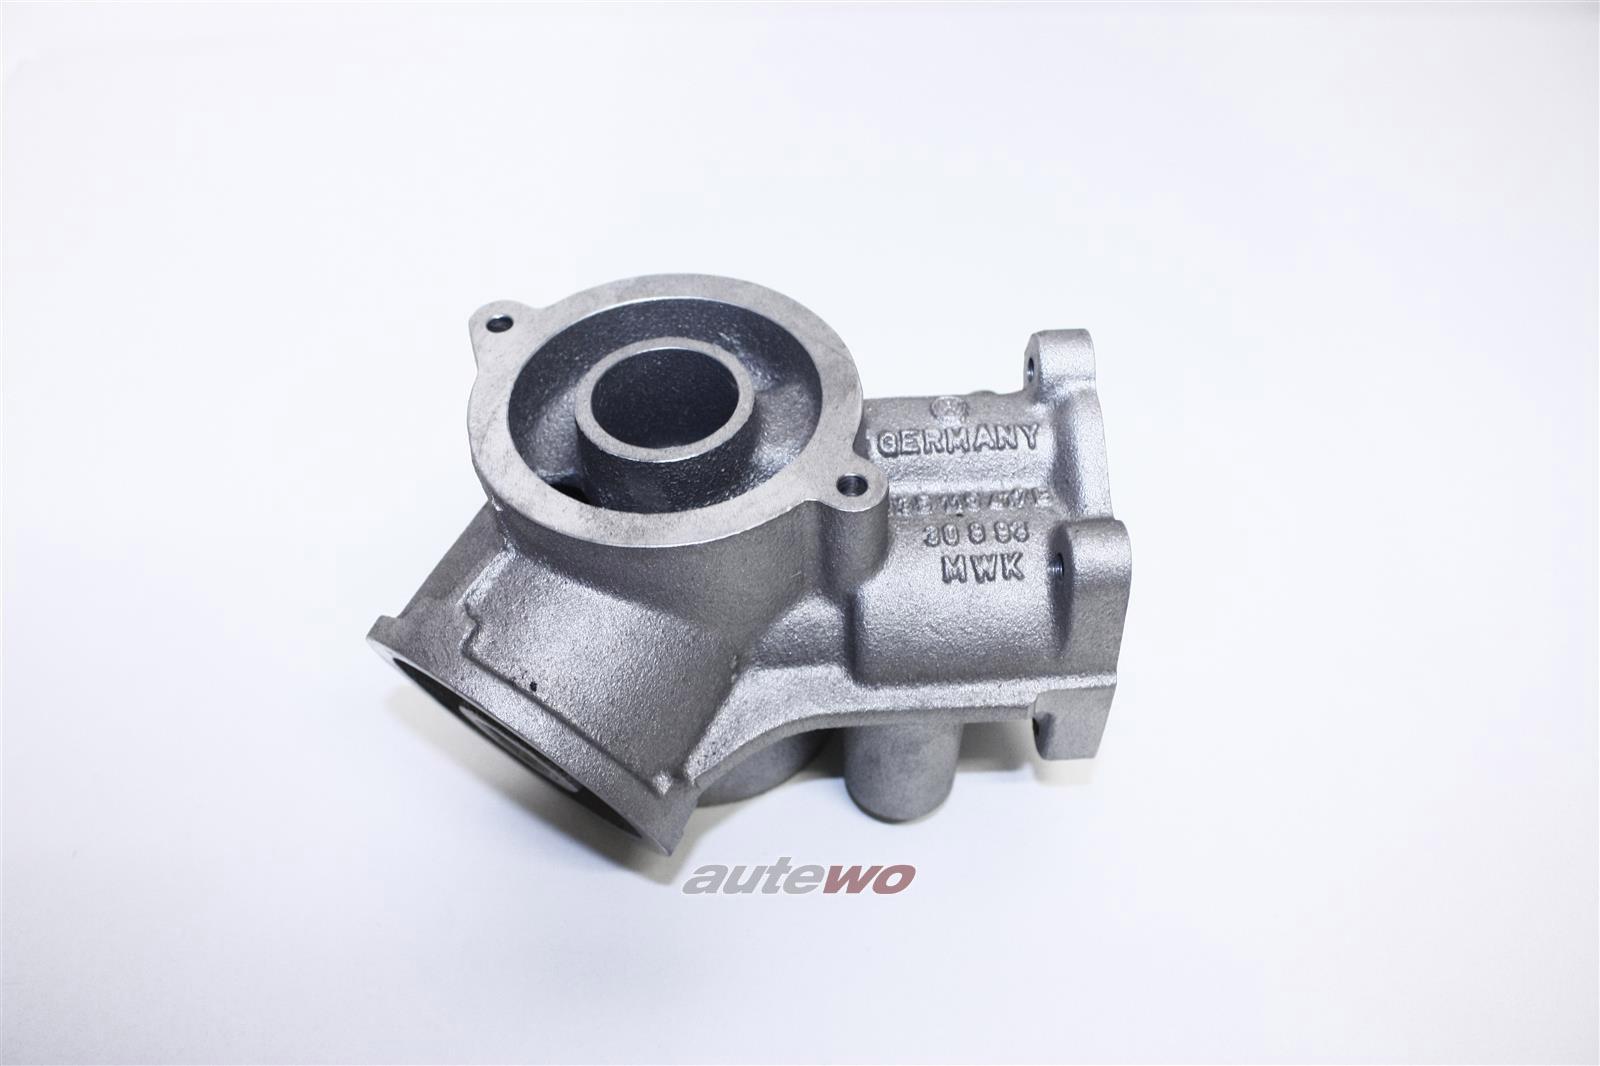 035115417B NEU Audi 100 Typ 44/Urquattro 10V Turbo WR/WX/GV/KG Ölfilterhalter